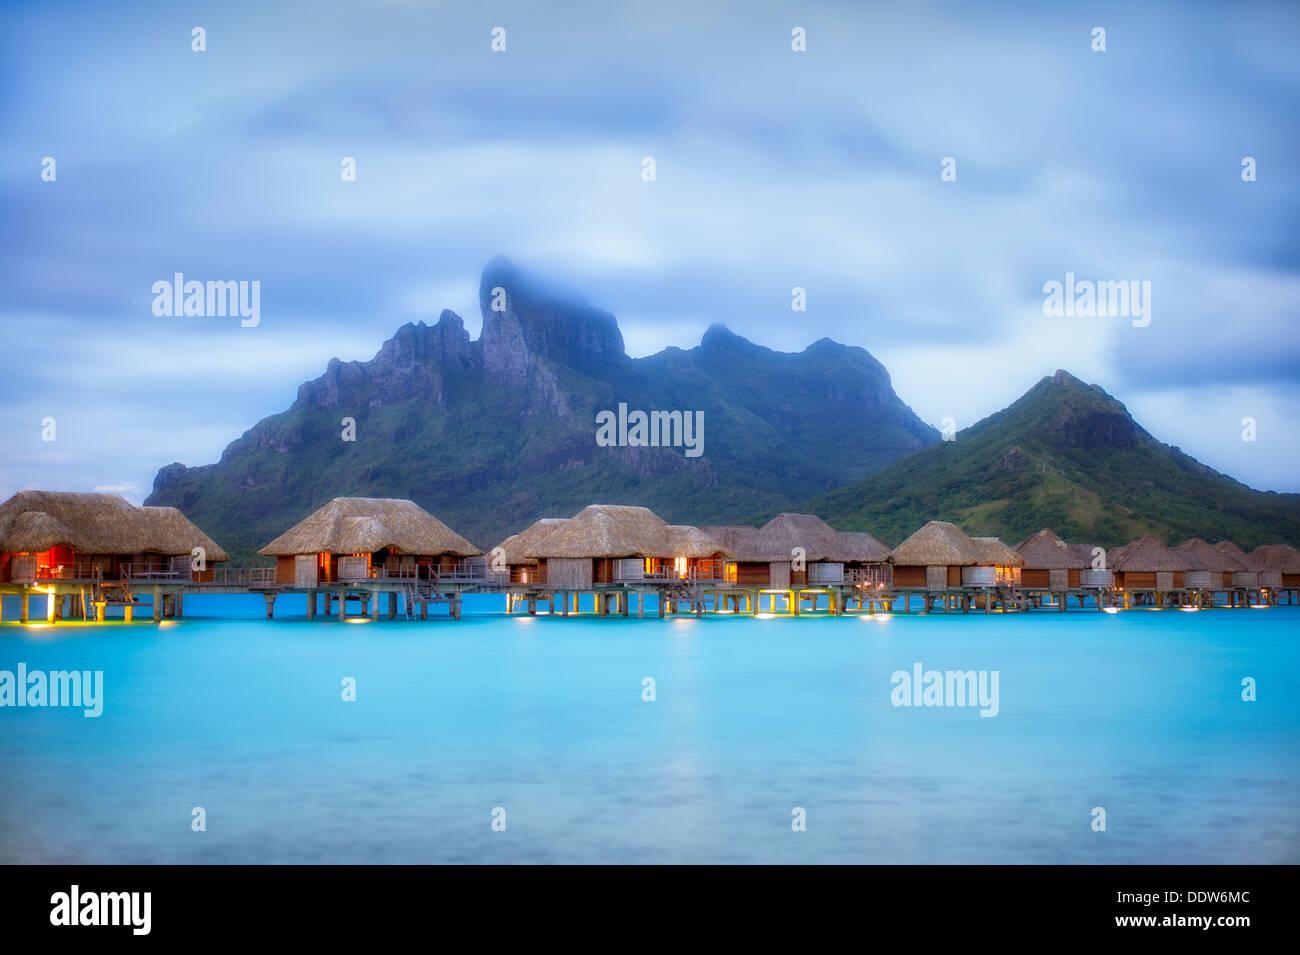 Pre sunrise and bungalows. Bora Bora. French Polynesia. - Stock Image